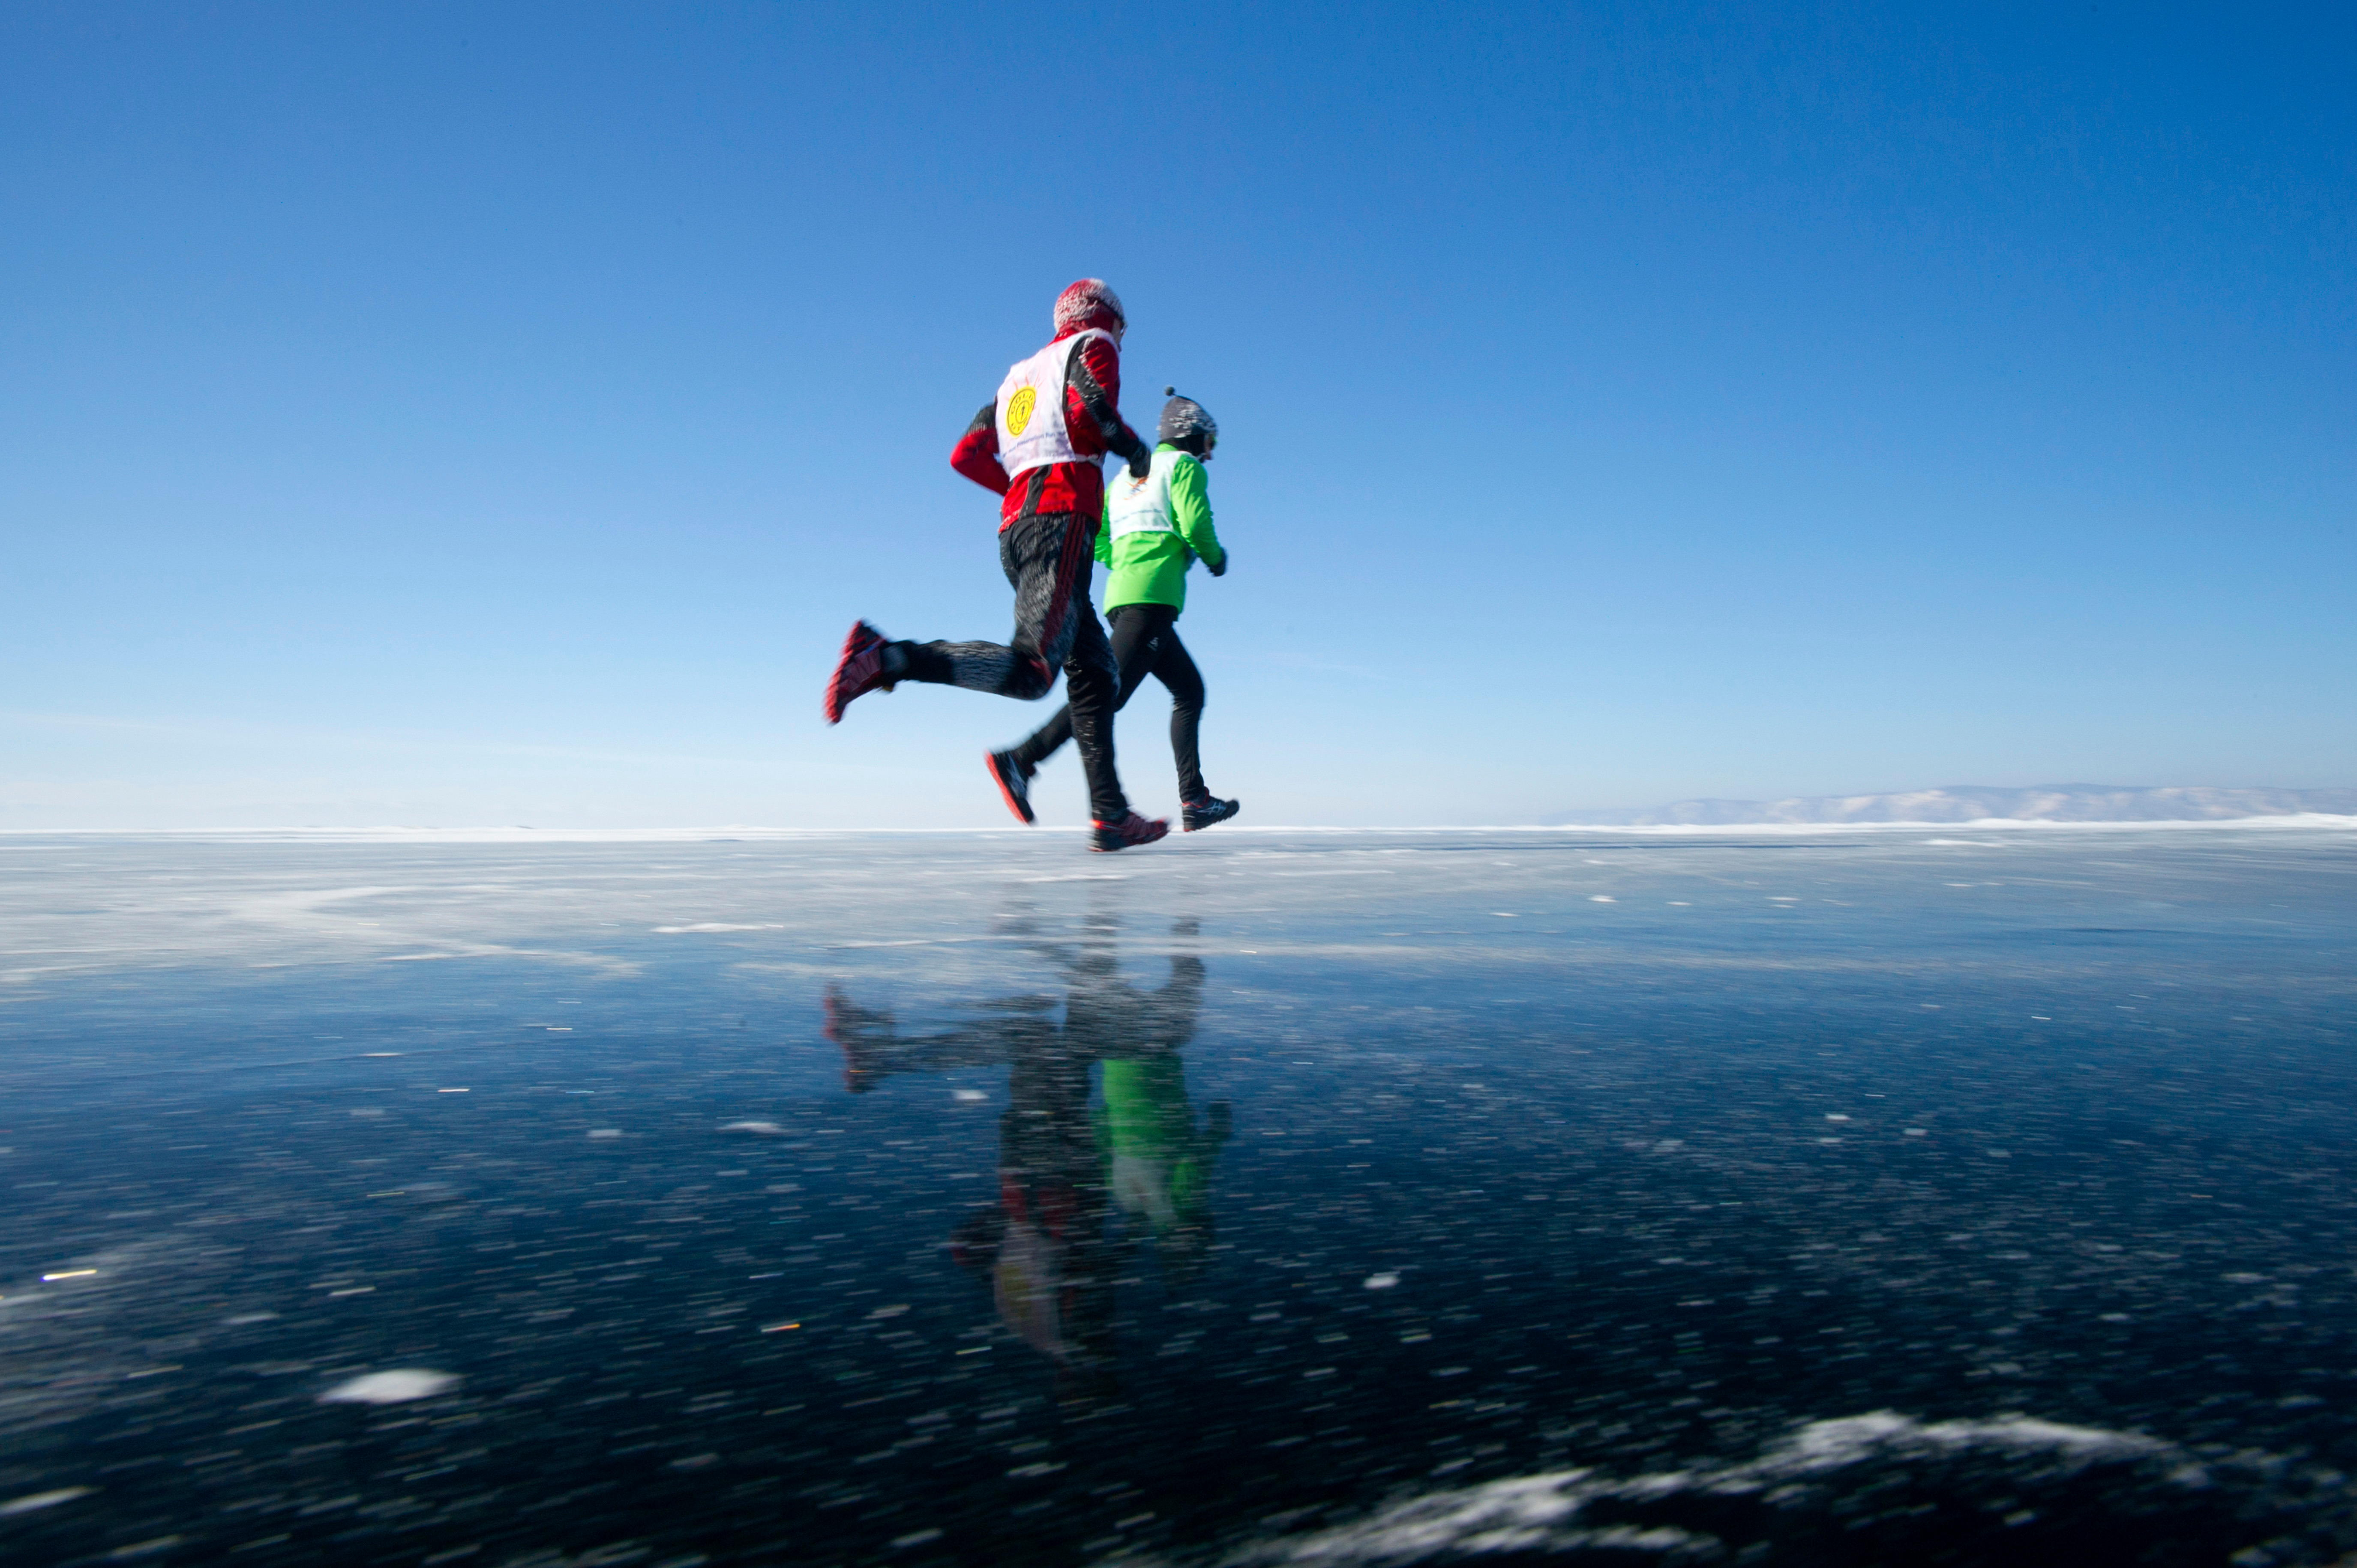 Susret s Bajkalom pun adrenalina